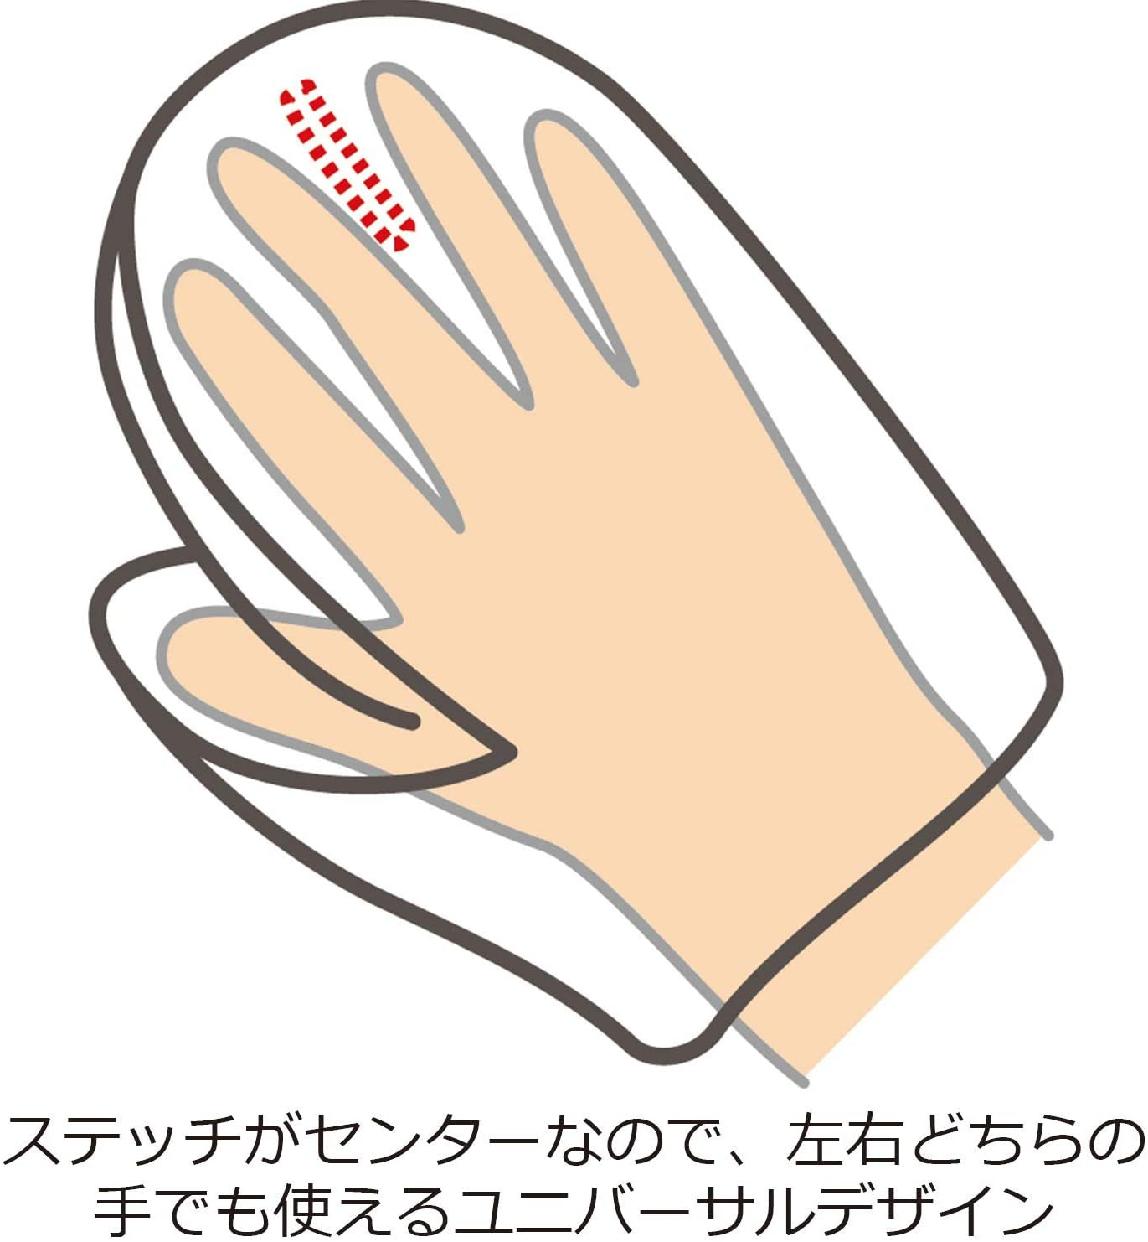 LEYE(レイエ) グッとつかめる耐熱ミトンの商品画像8